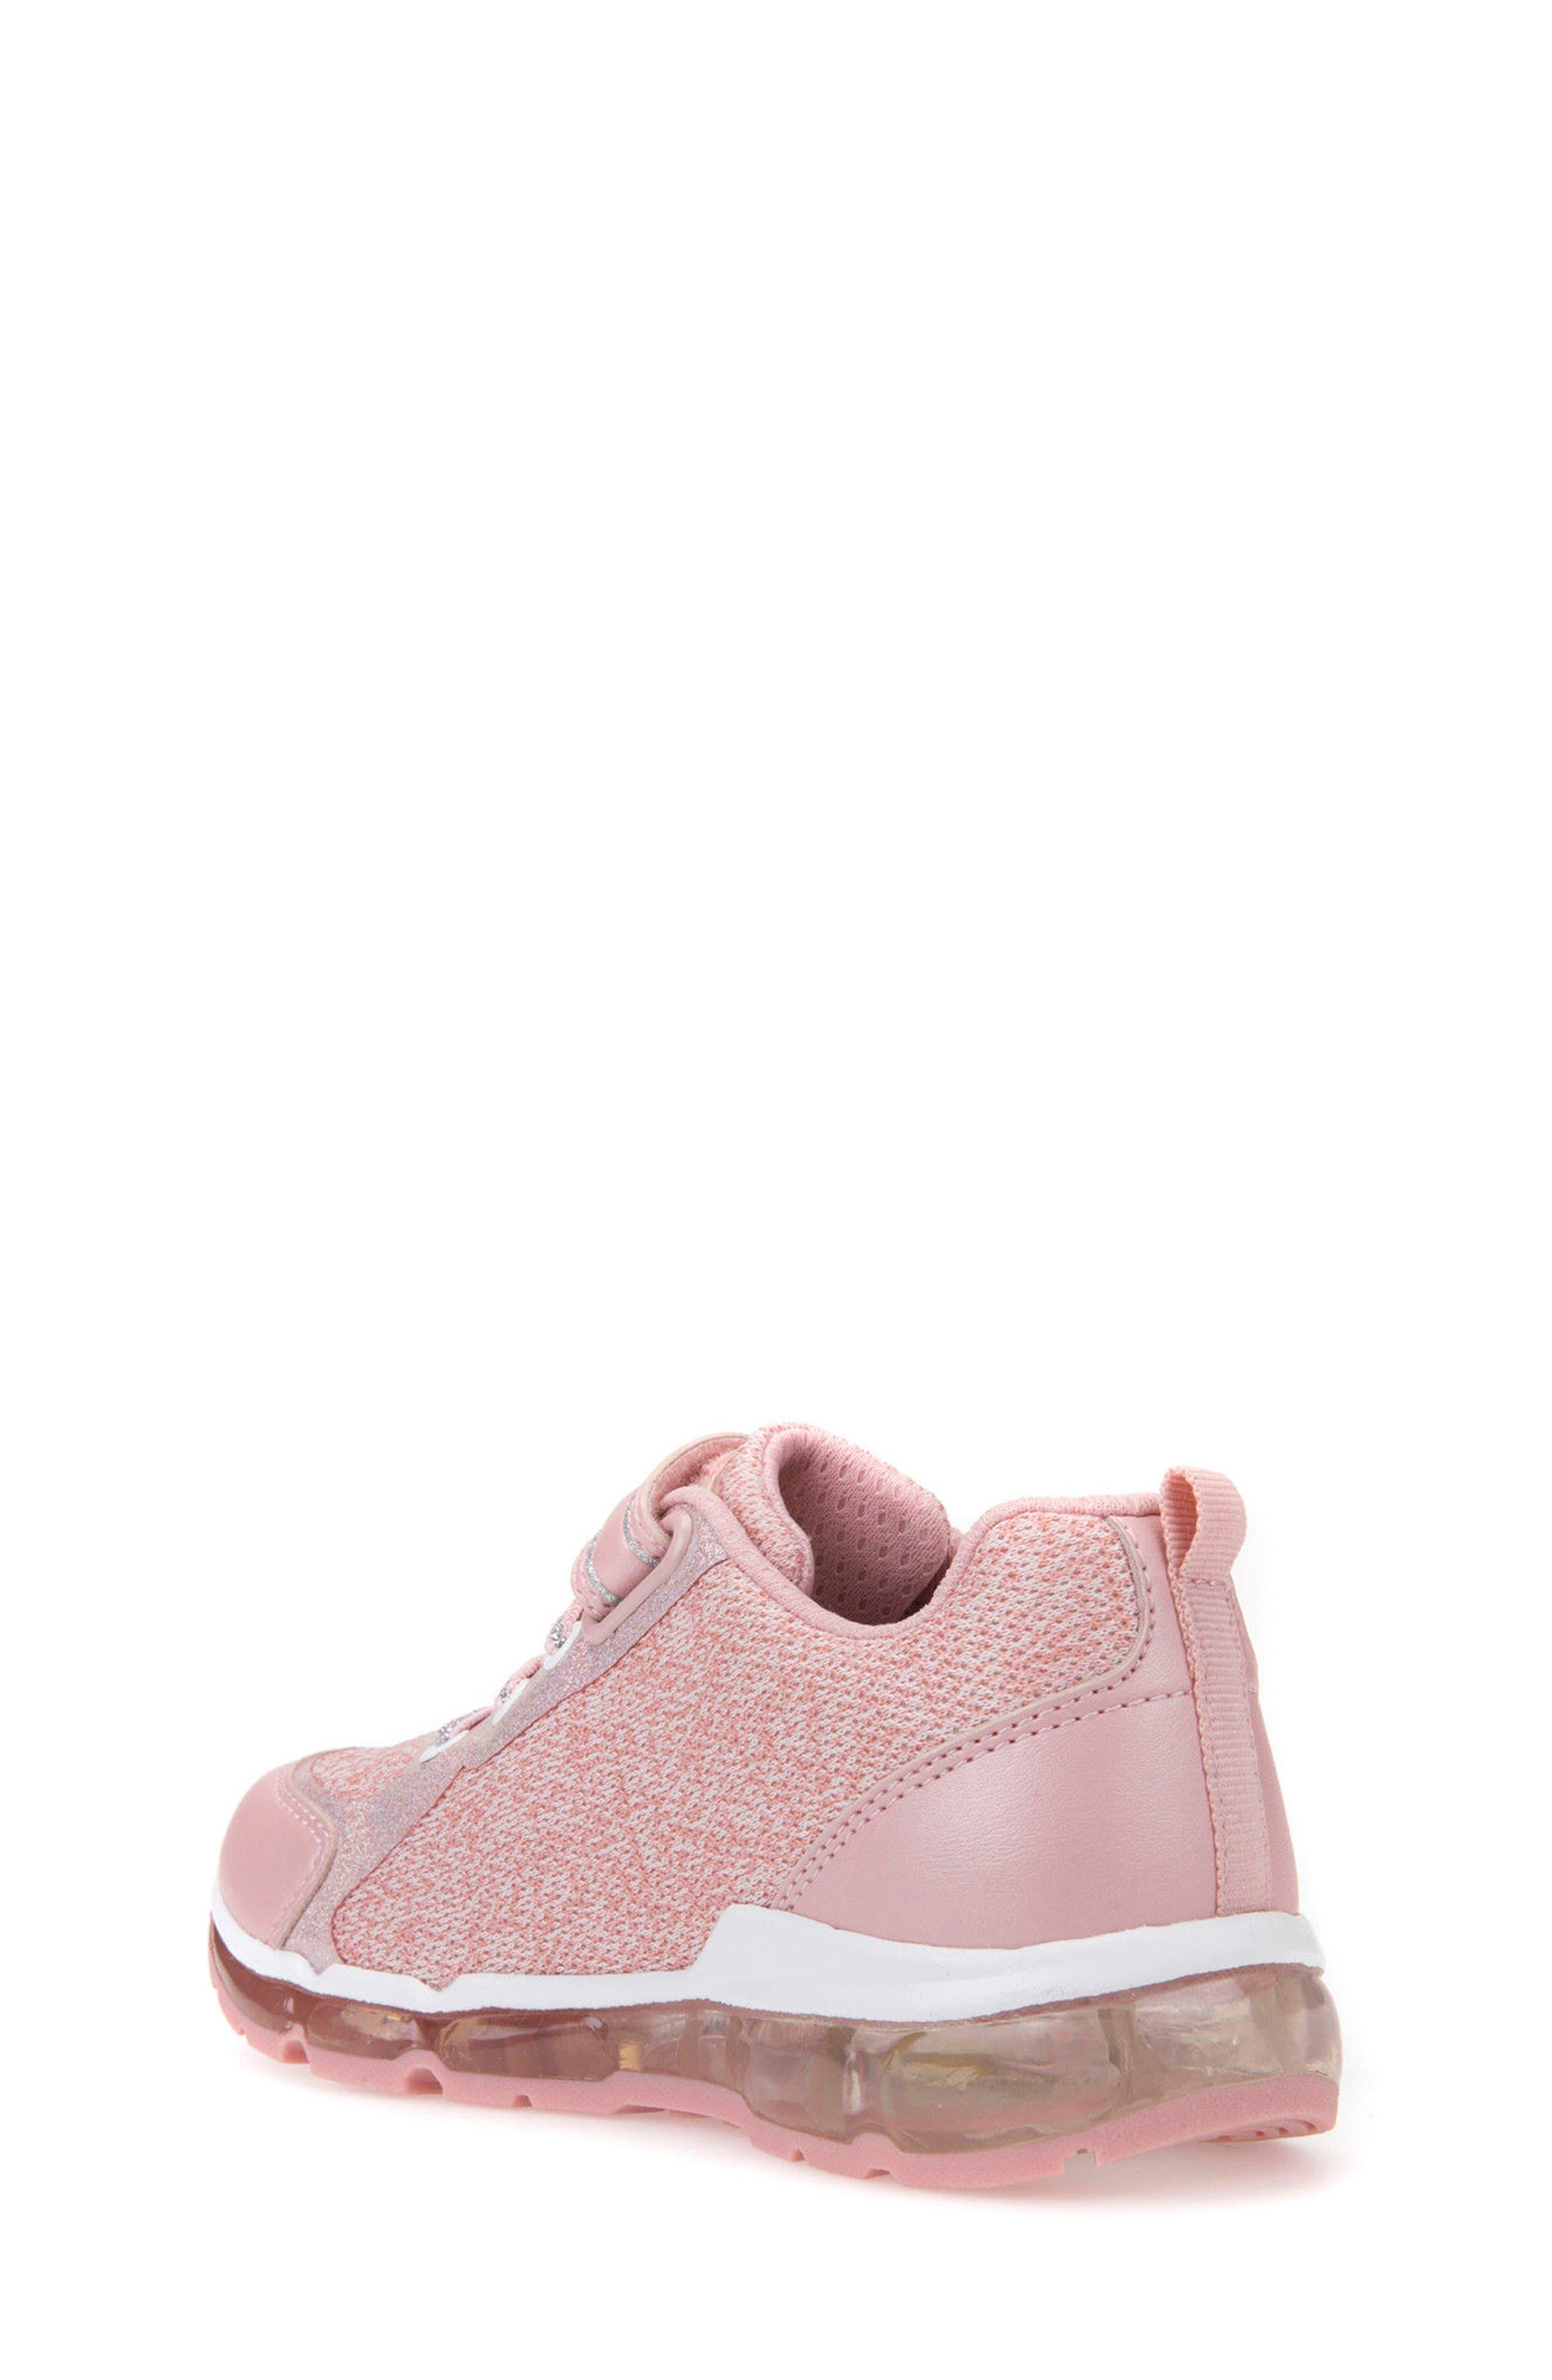 Android Light-Up Sneaker,                             Alternate thumbnail 2, color,                             Rose/ White